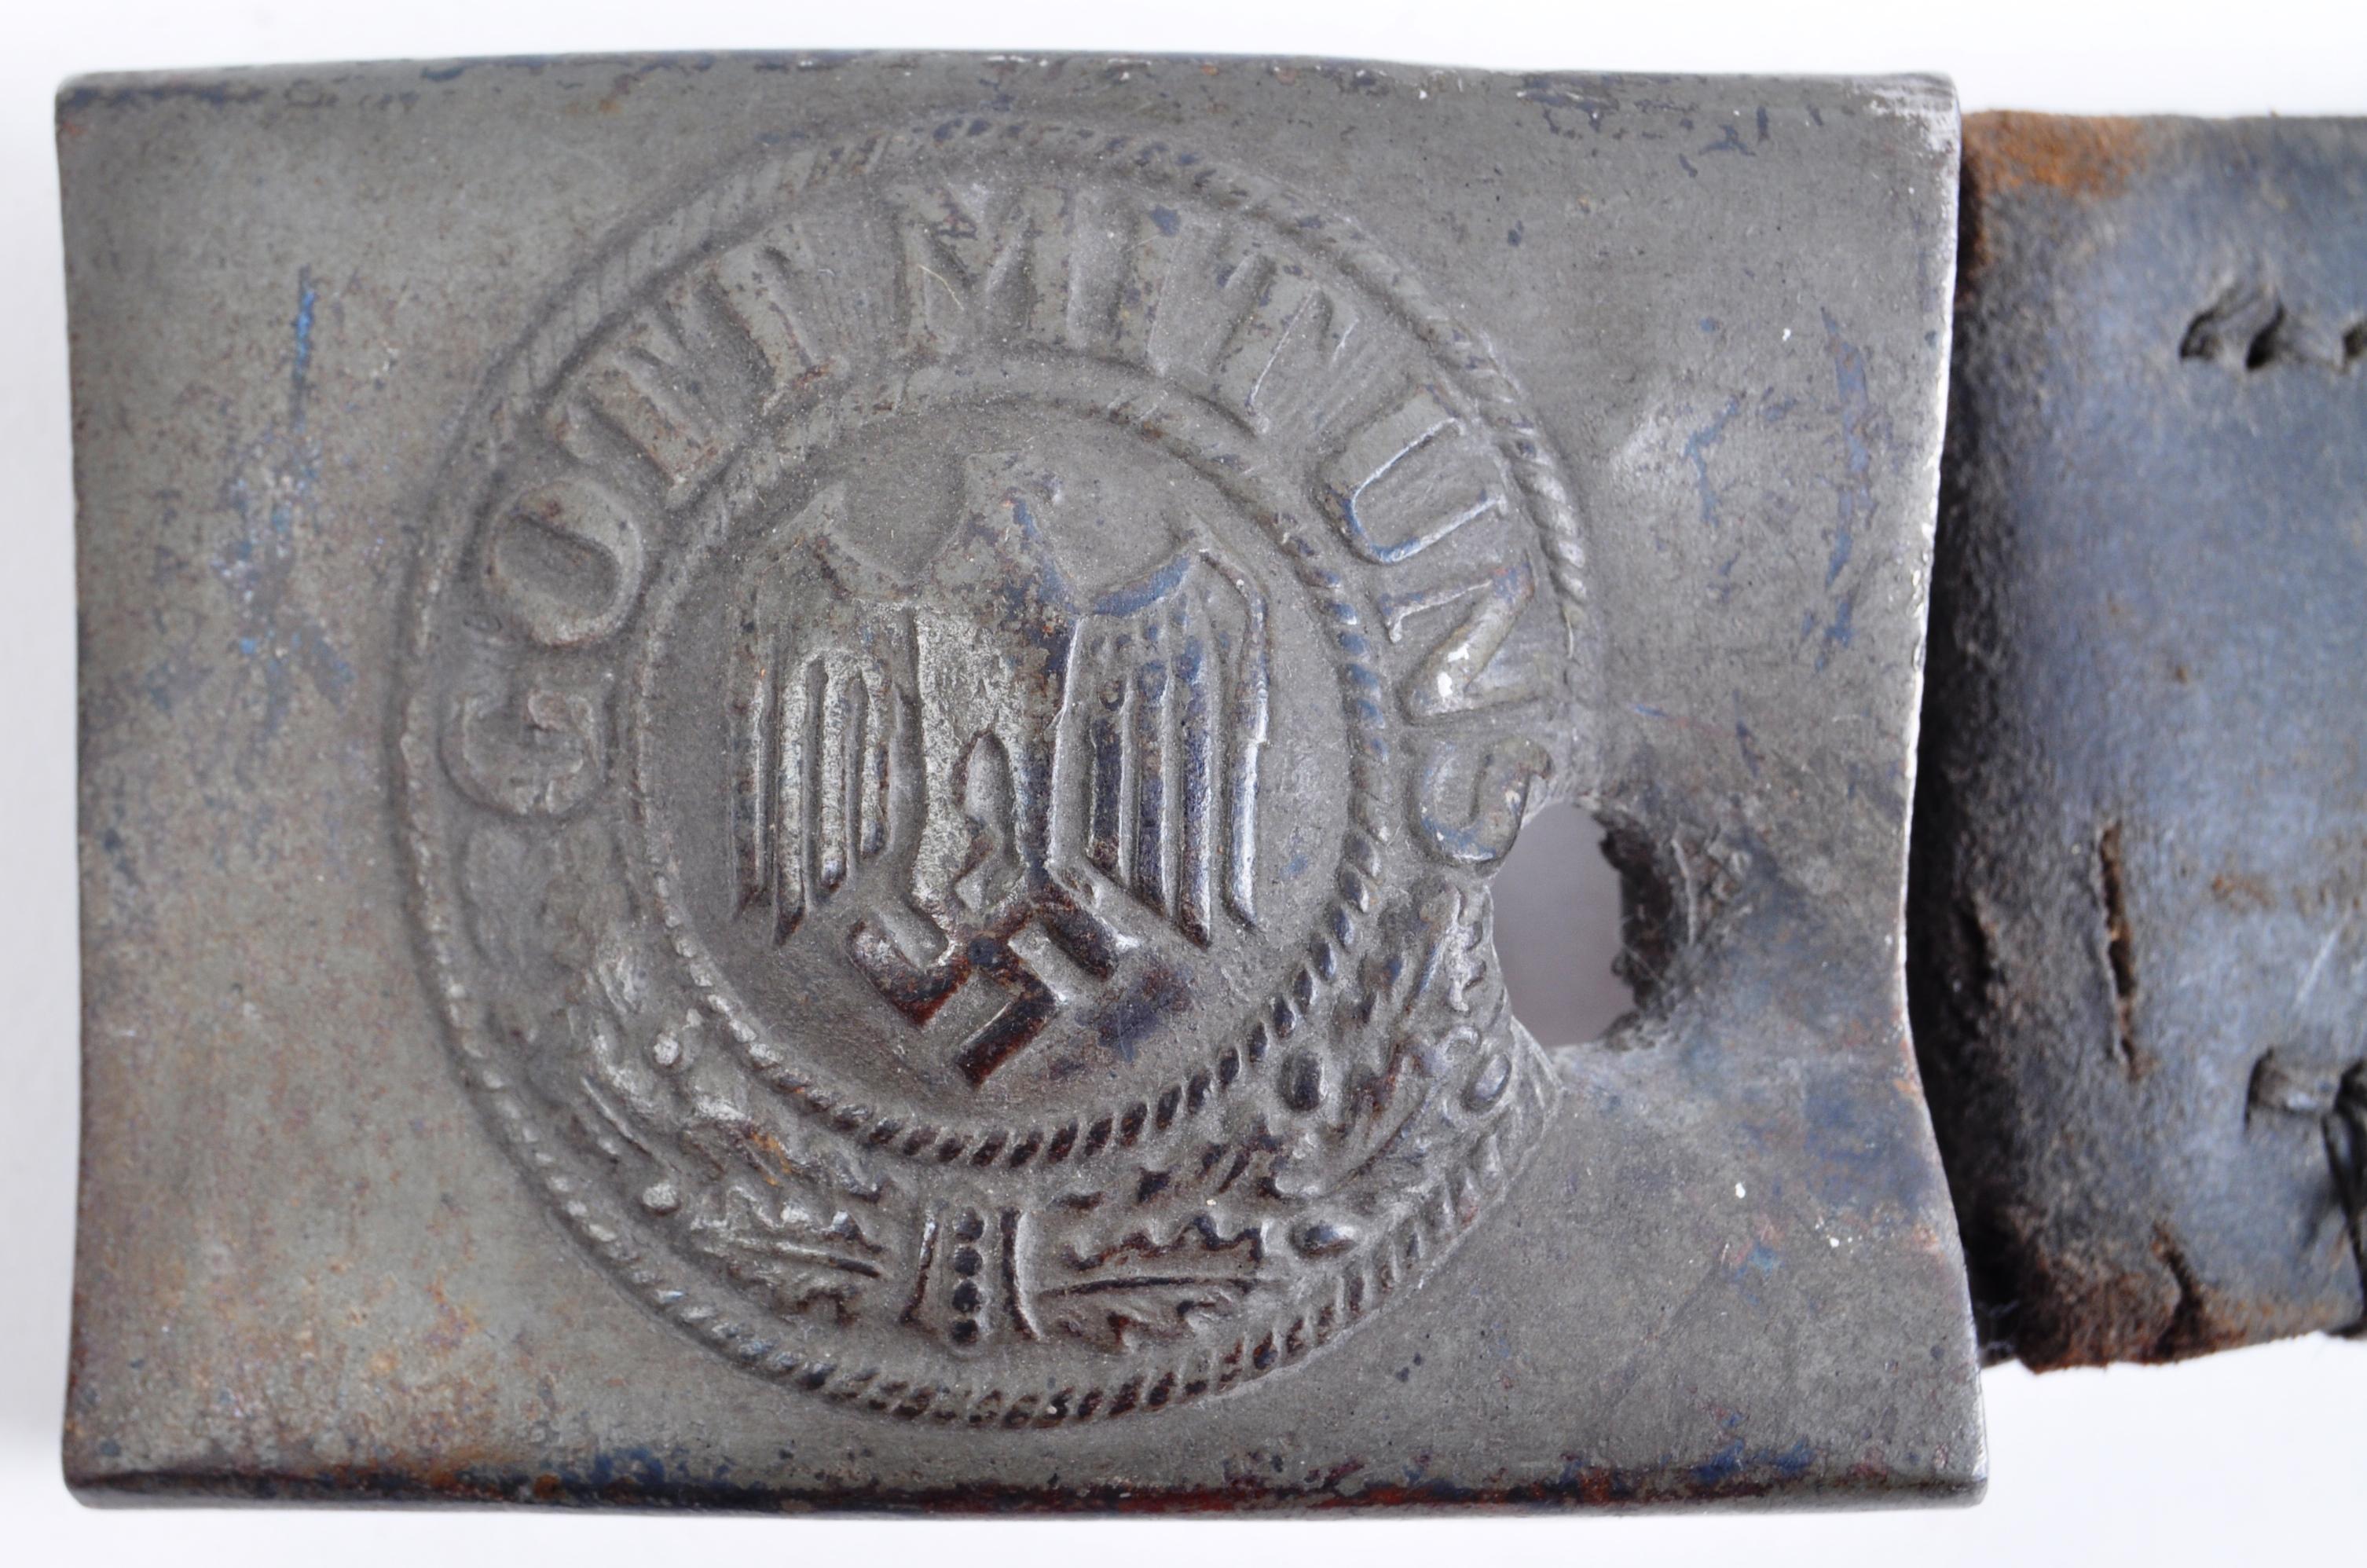 ORIGINAL WWII SECOND WORLD WAR GERMAN BELT BUCKLE W/BULLET HOLE - Image 2 of 5